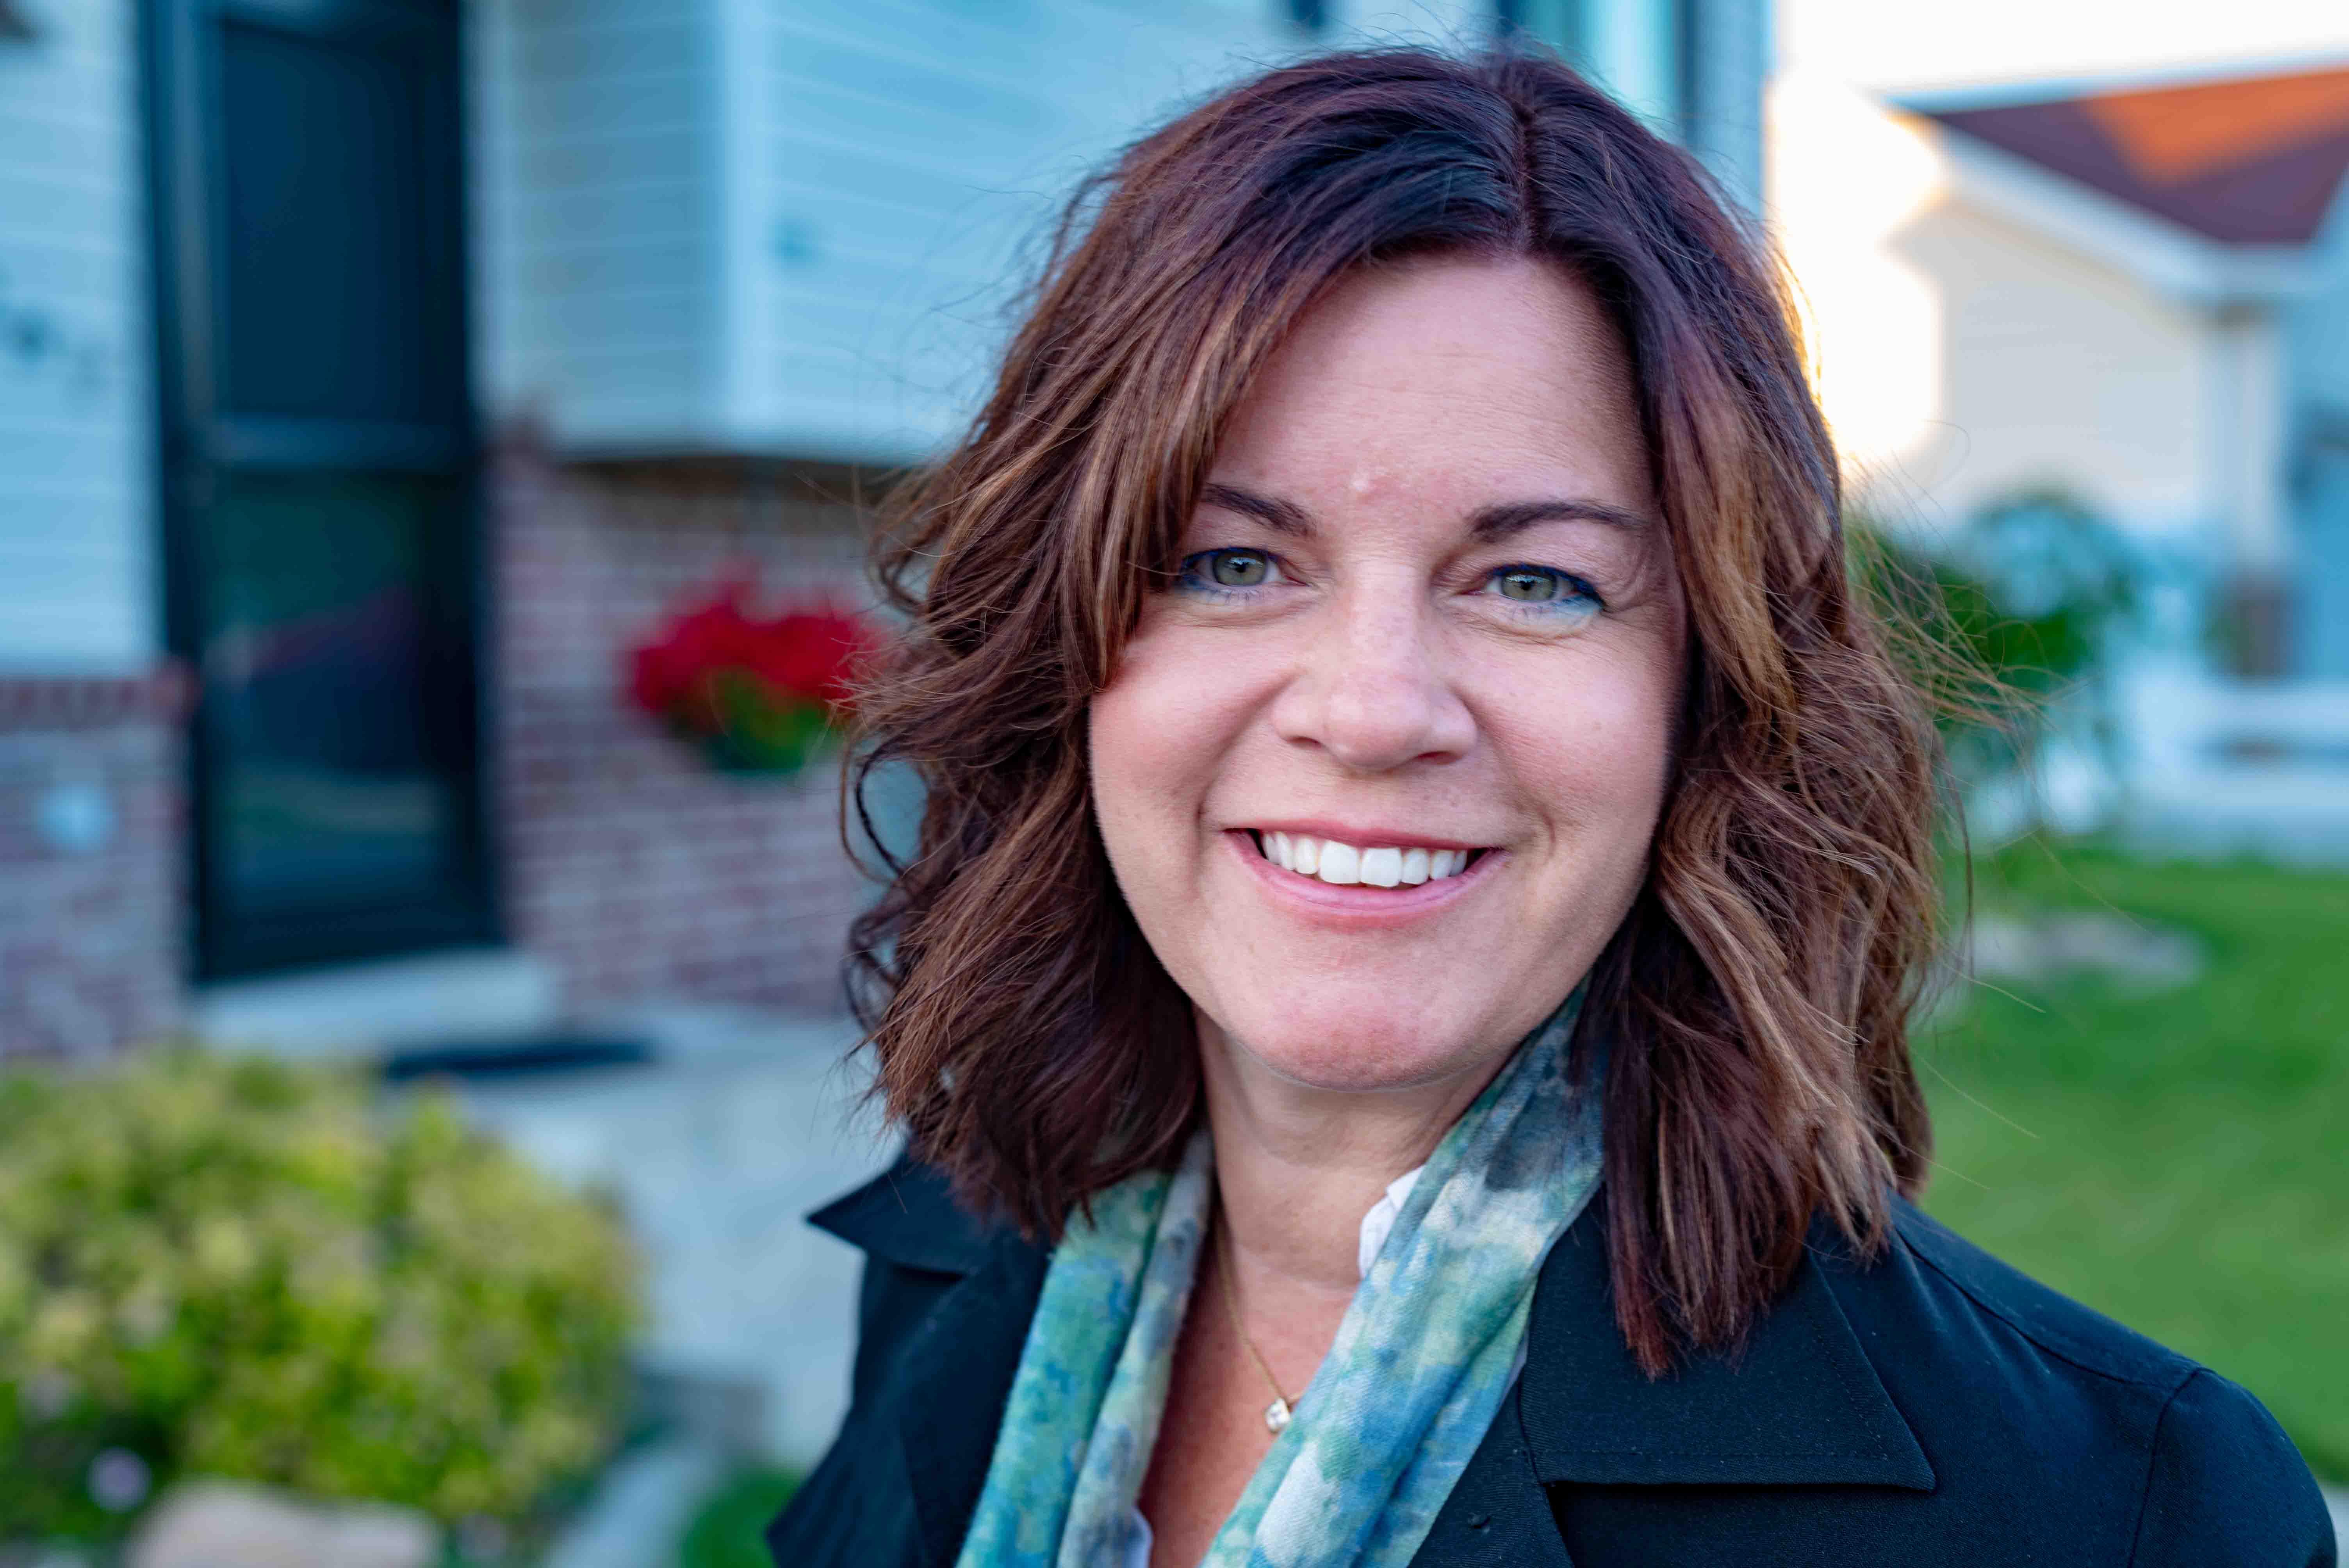 Annette Judd